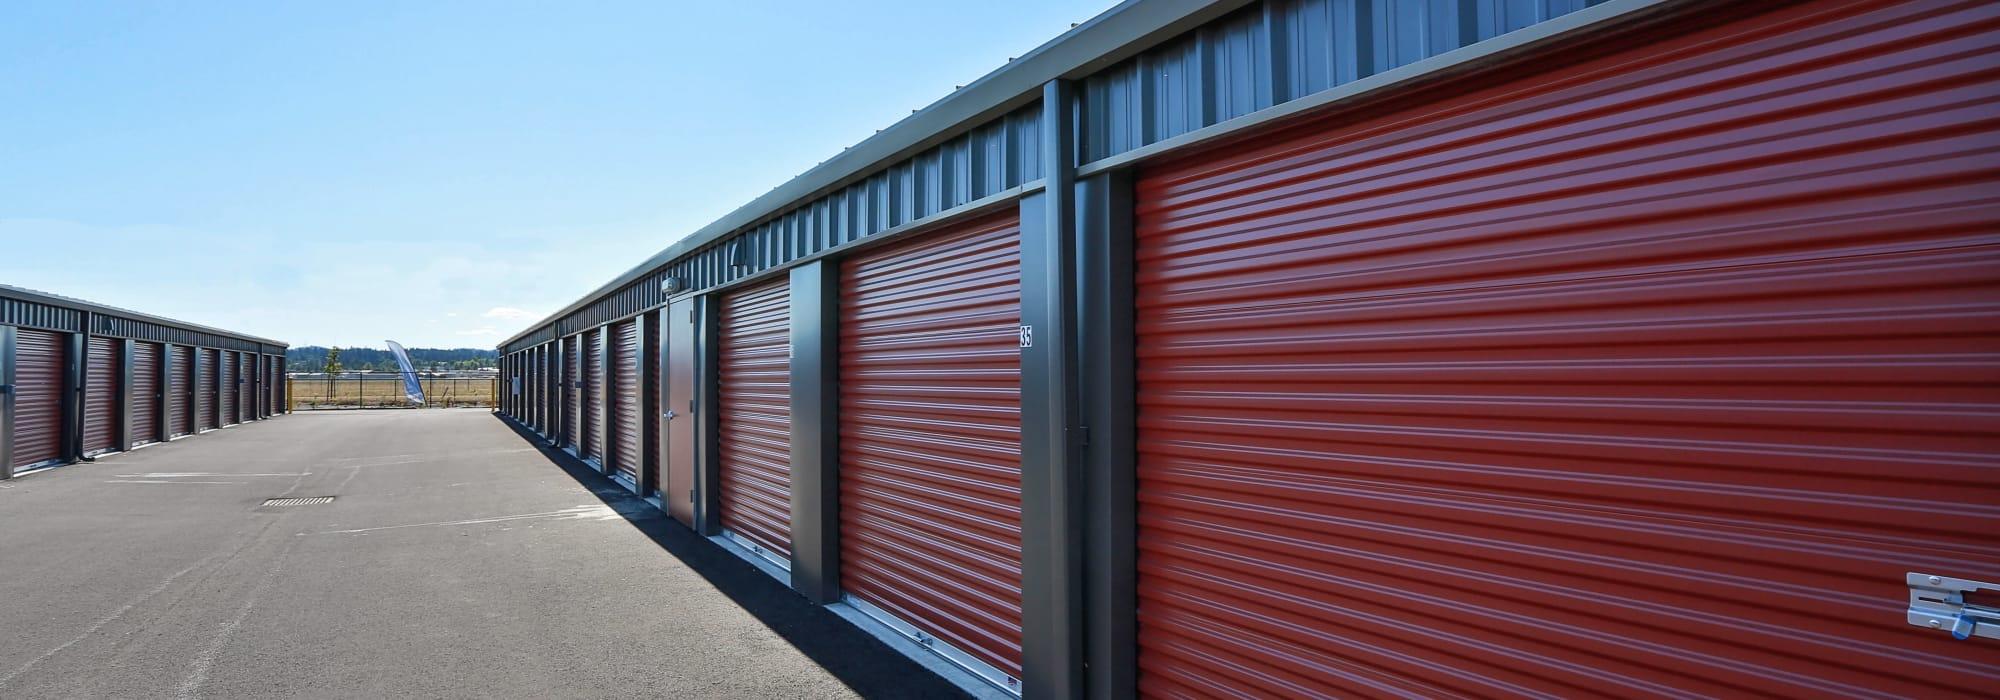 Self storage in Salem, Oregon